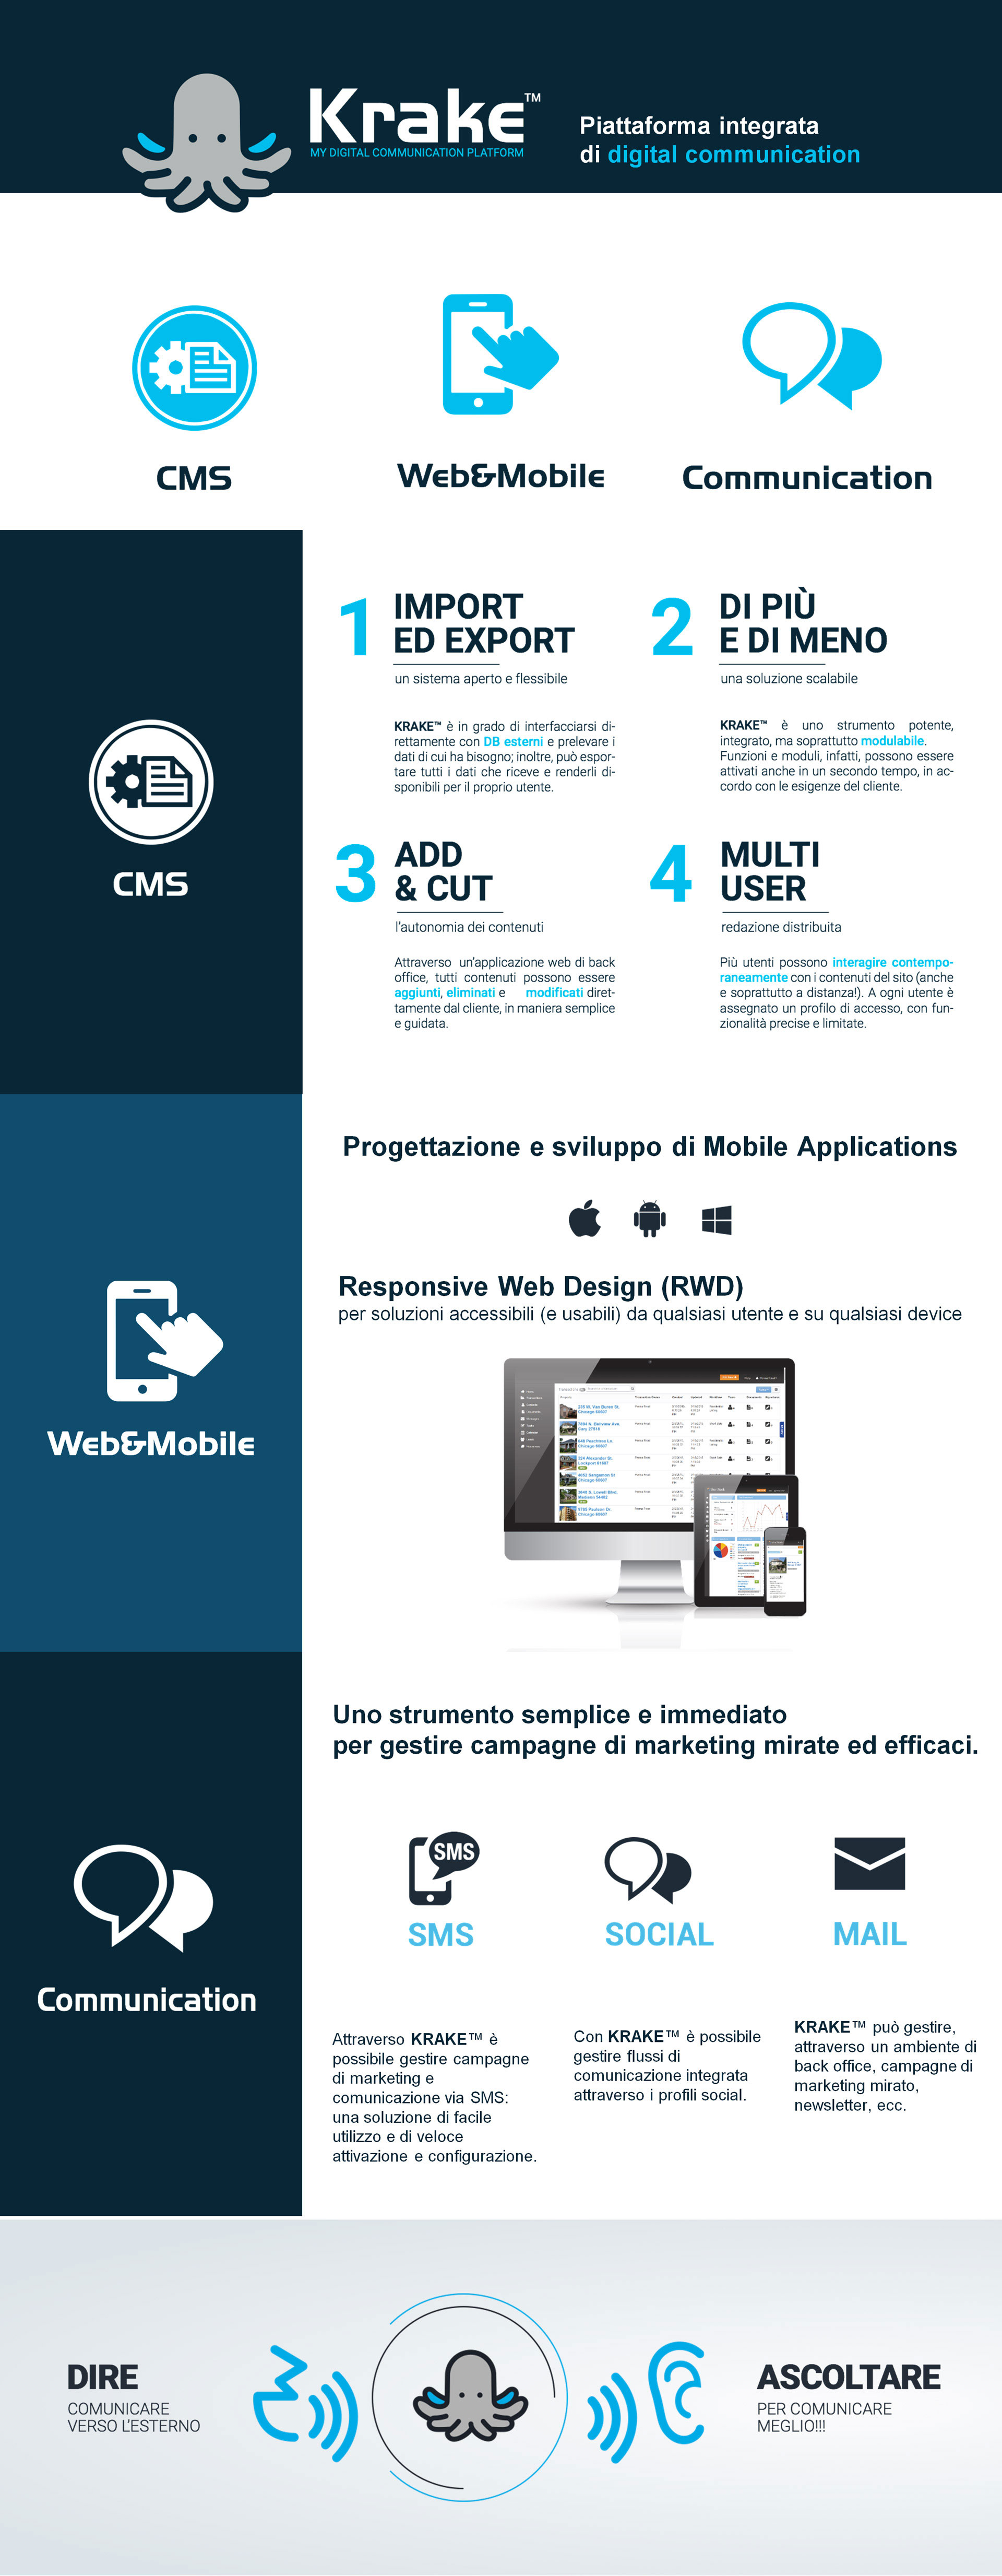 krake infographic